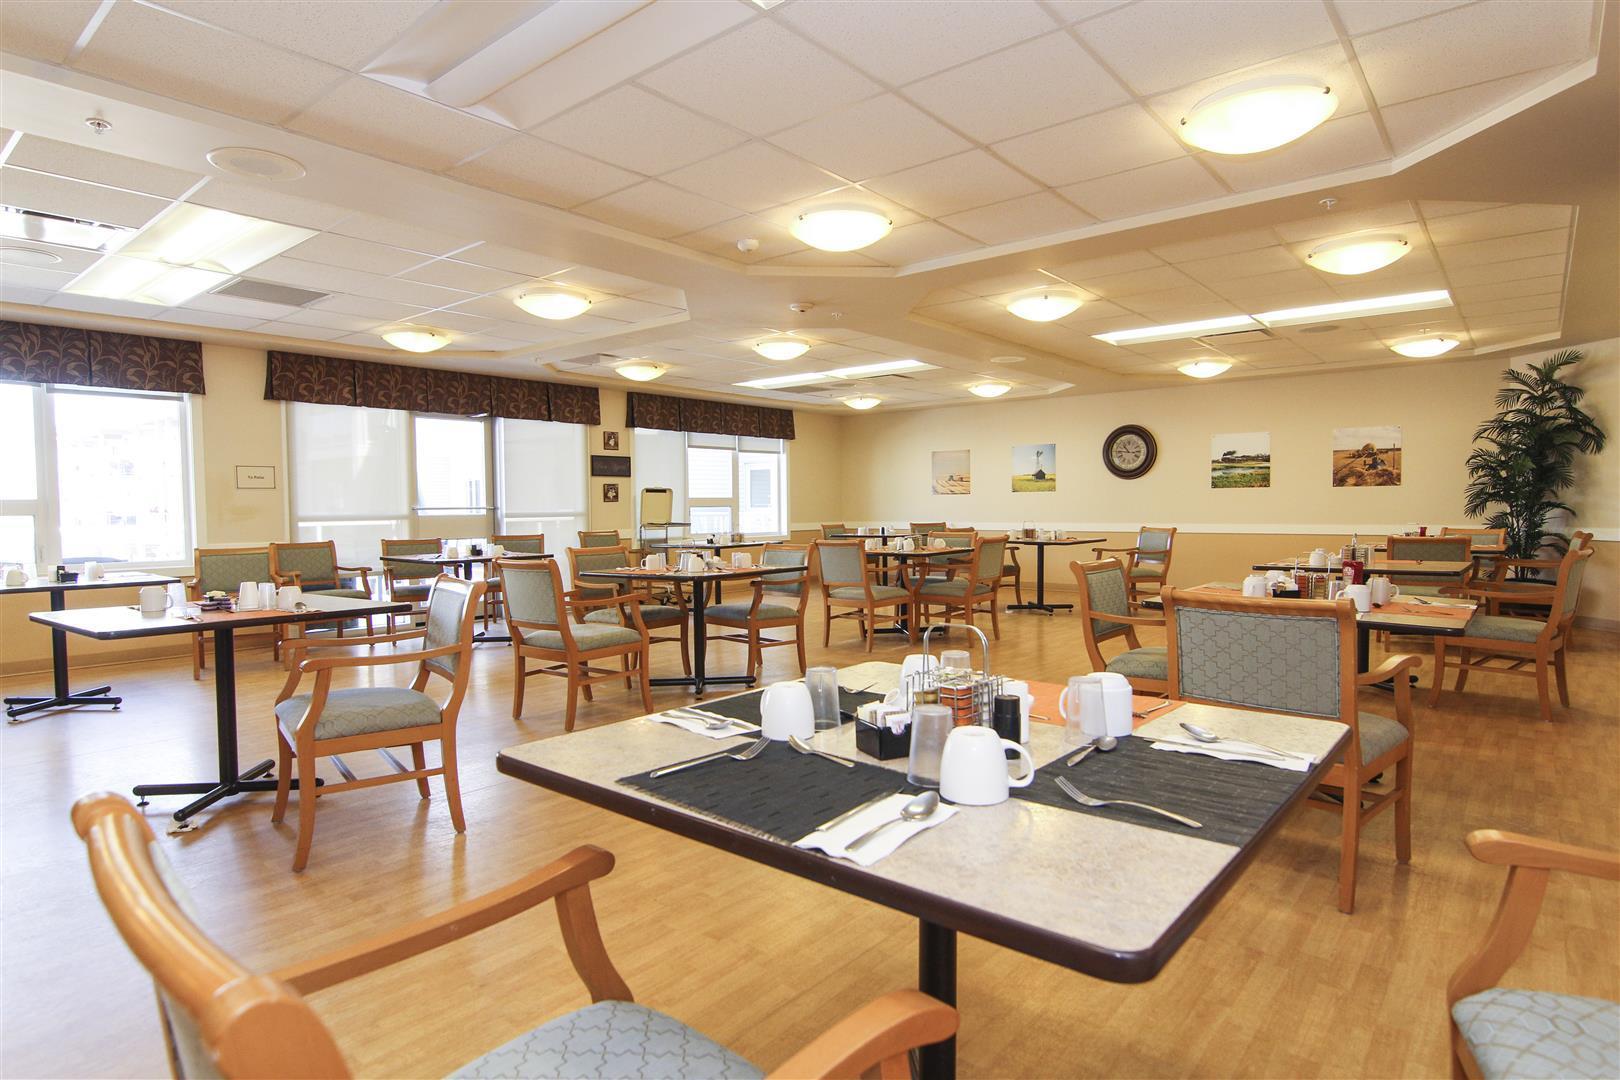 comfortable senior living furniture at discount custom made room decoration-1